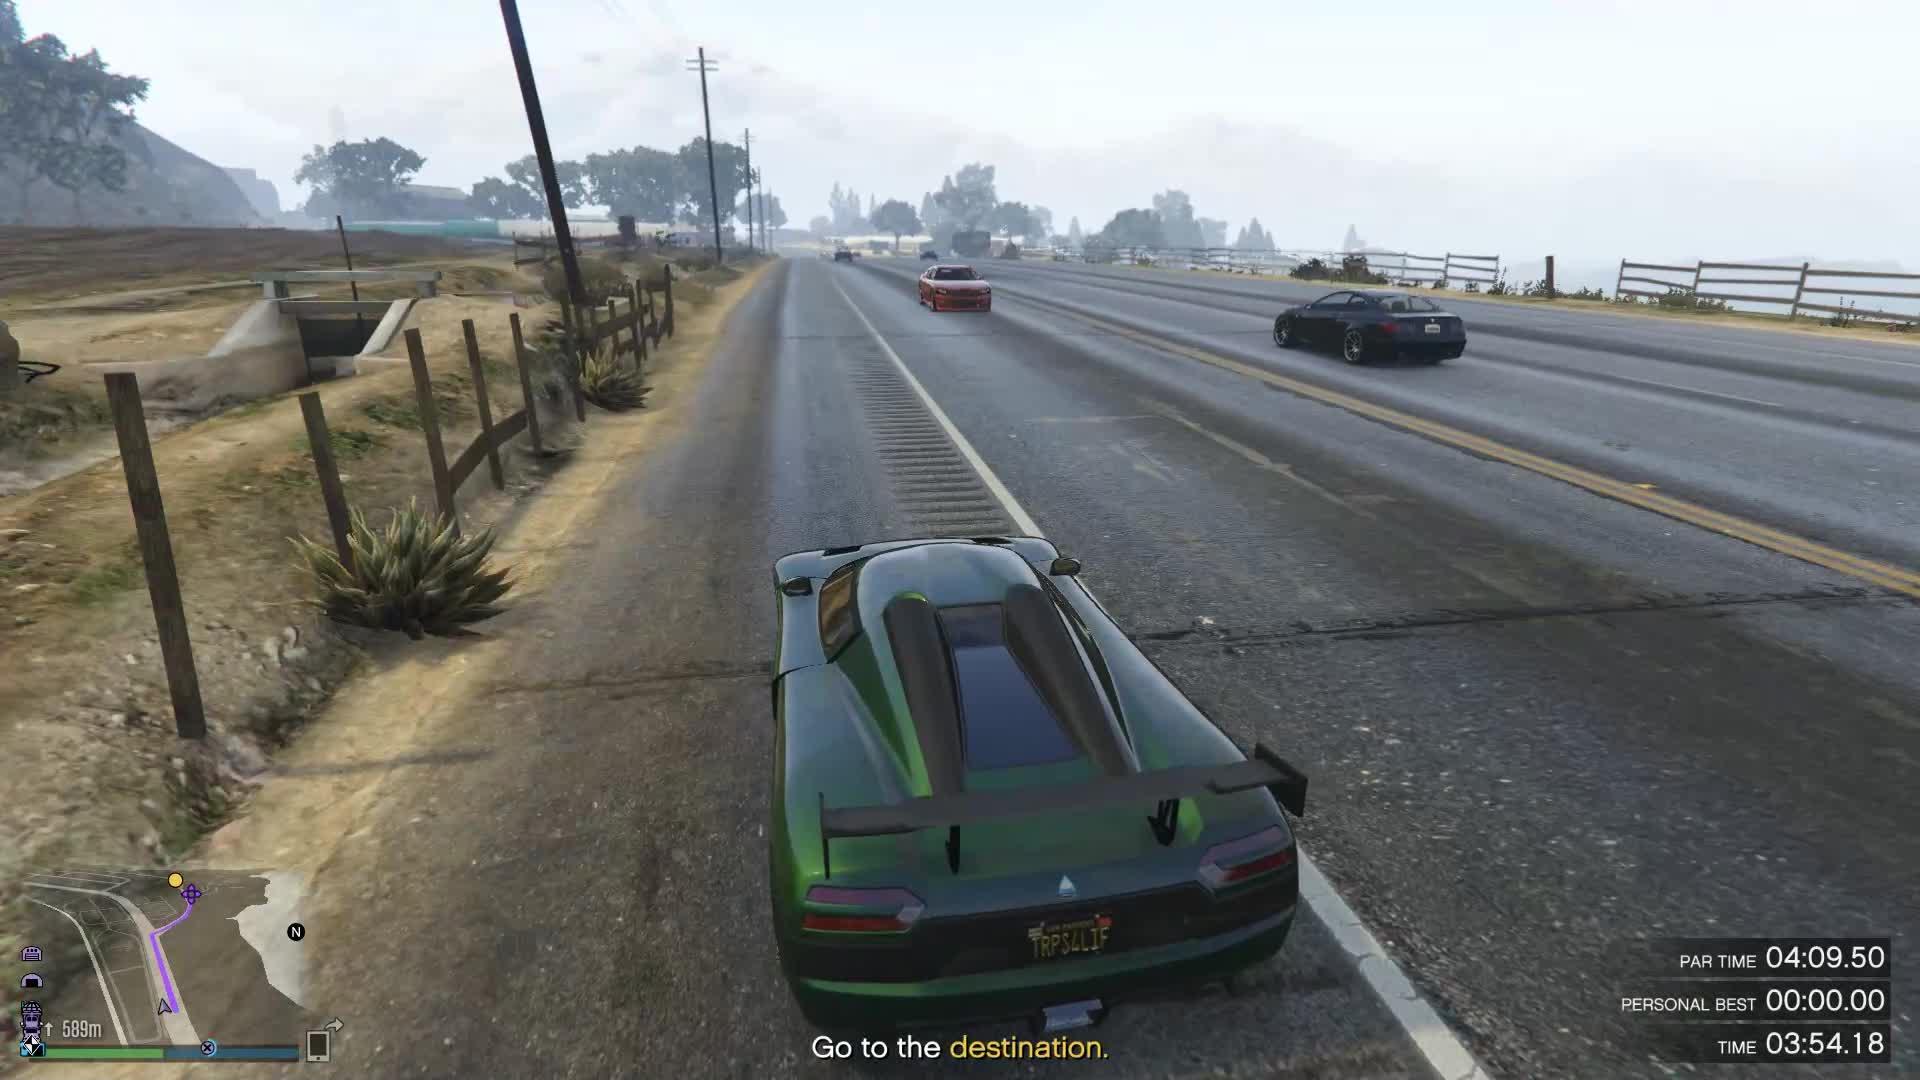 grandtheftautov, Grand Theft Auto V 2019.08.01 - 22.04.06.18.DVR GIFs